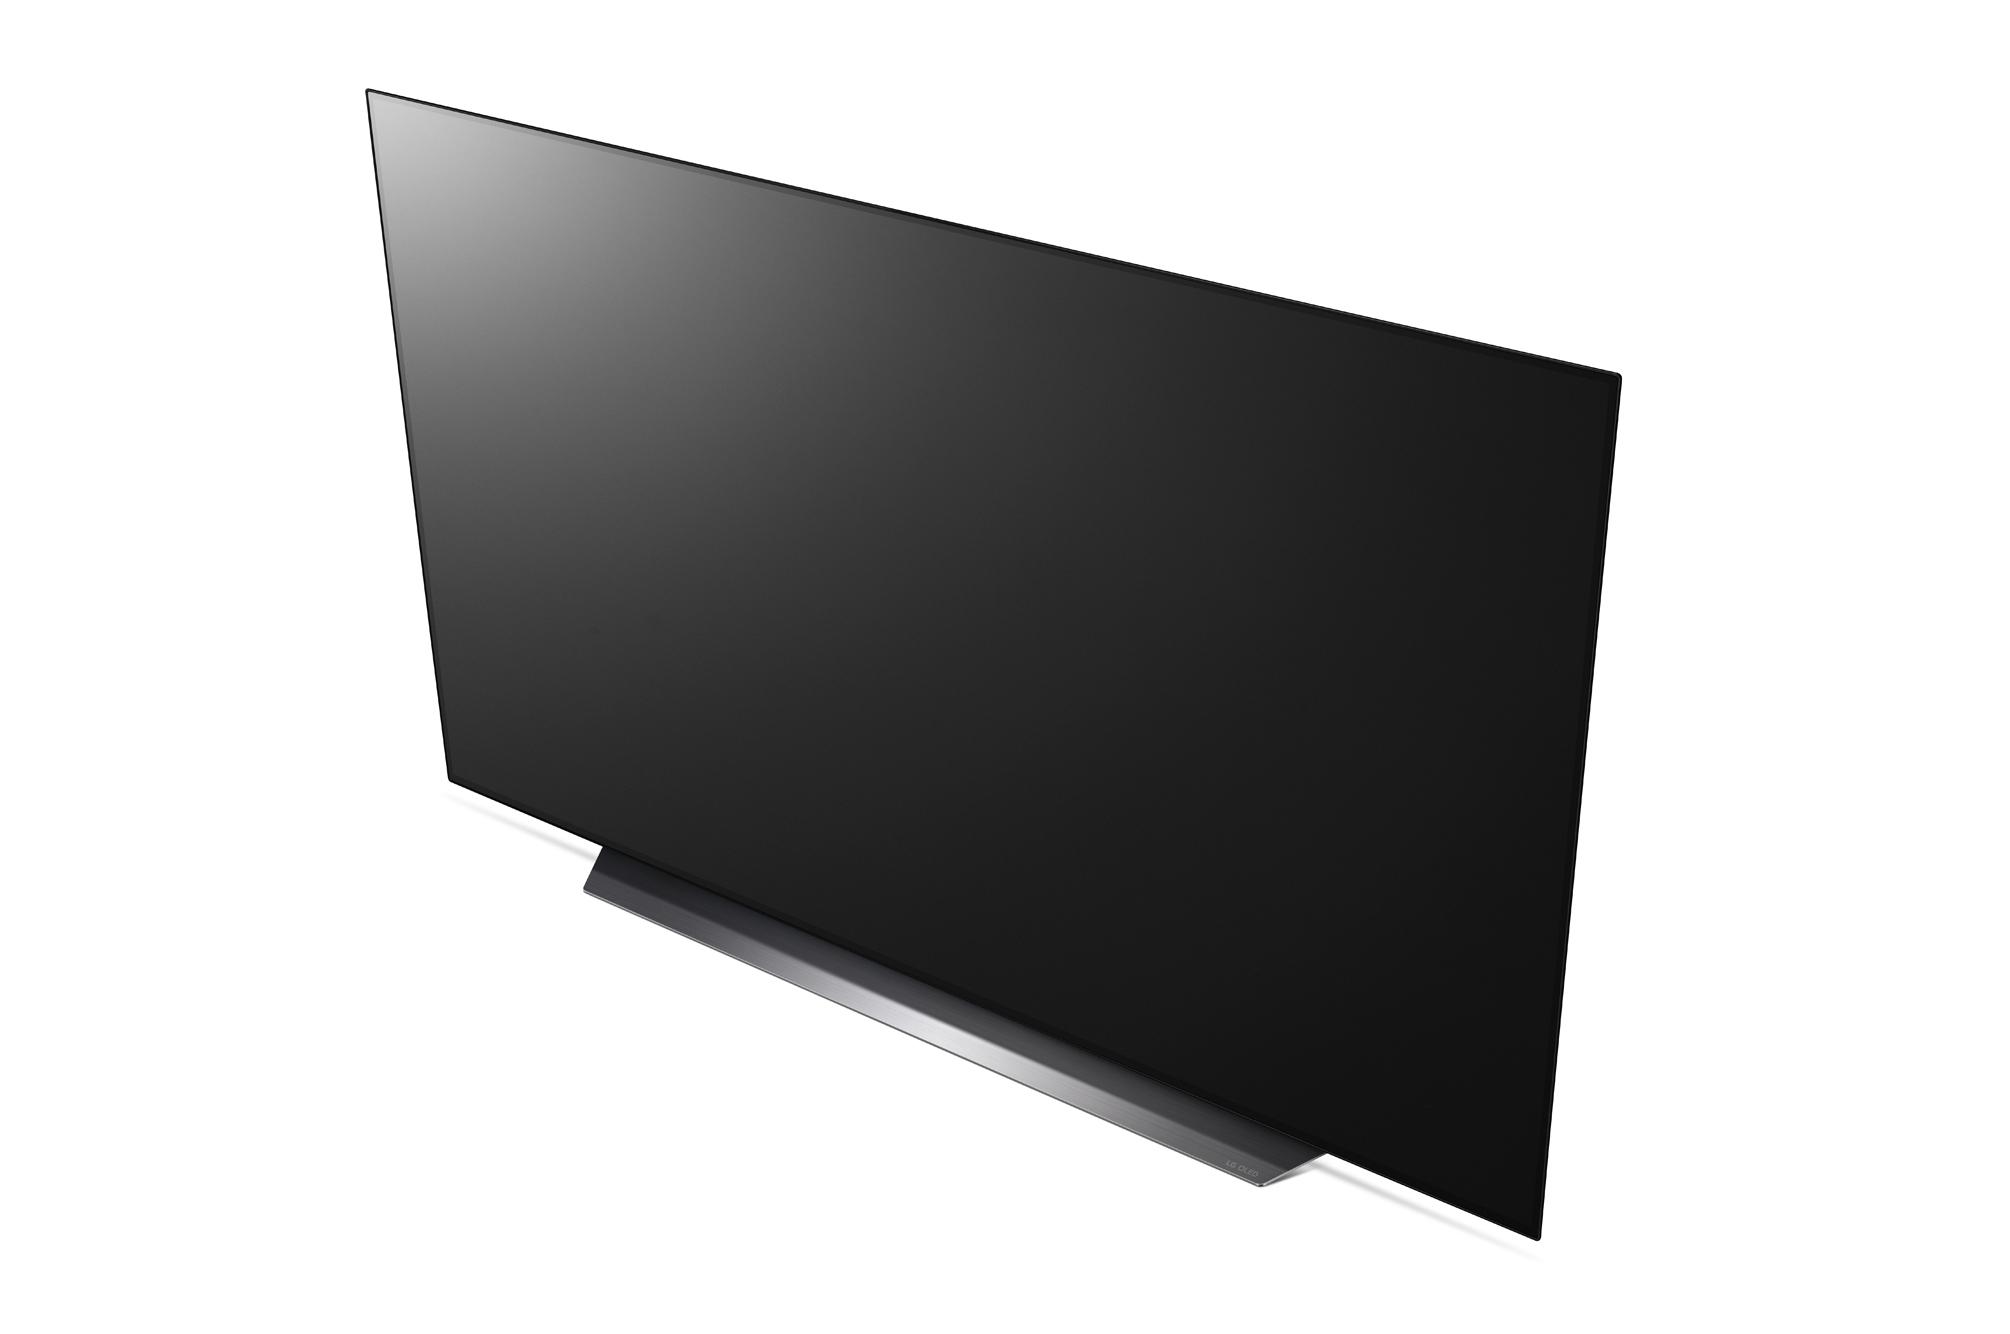 LG Pro:Centric SMART 65ET960H (NA) 8